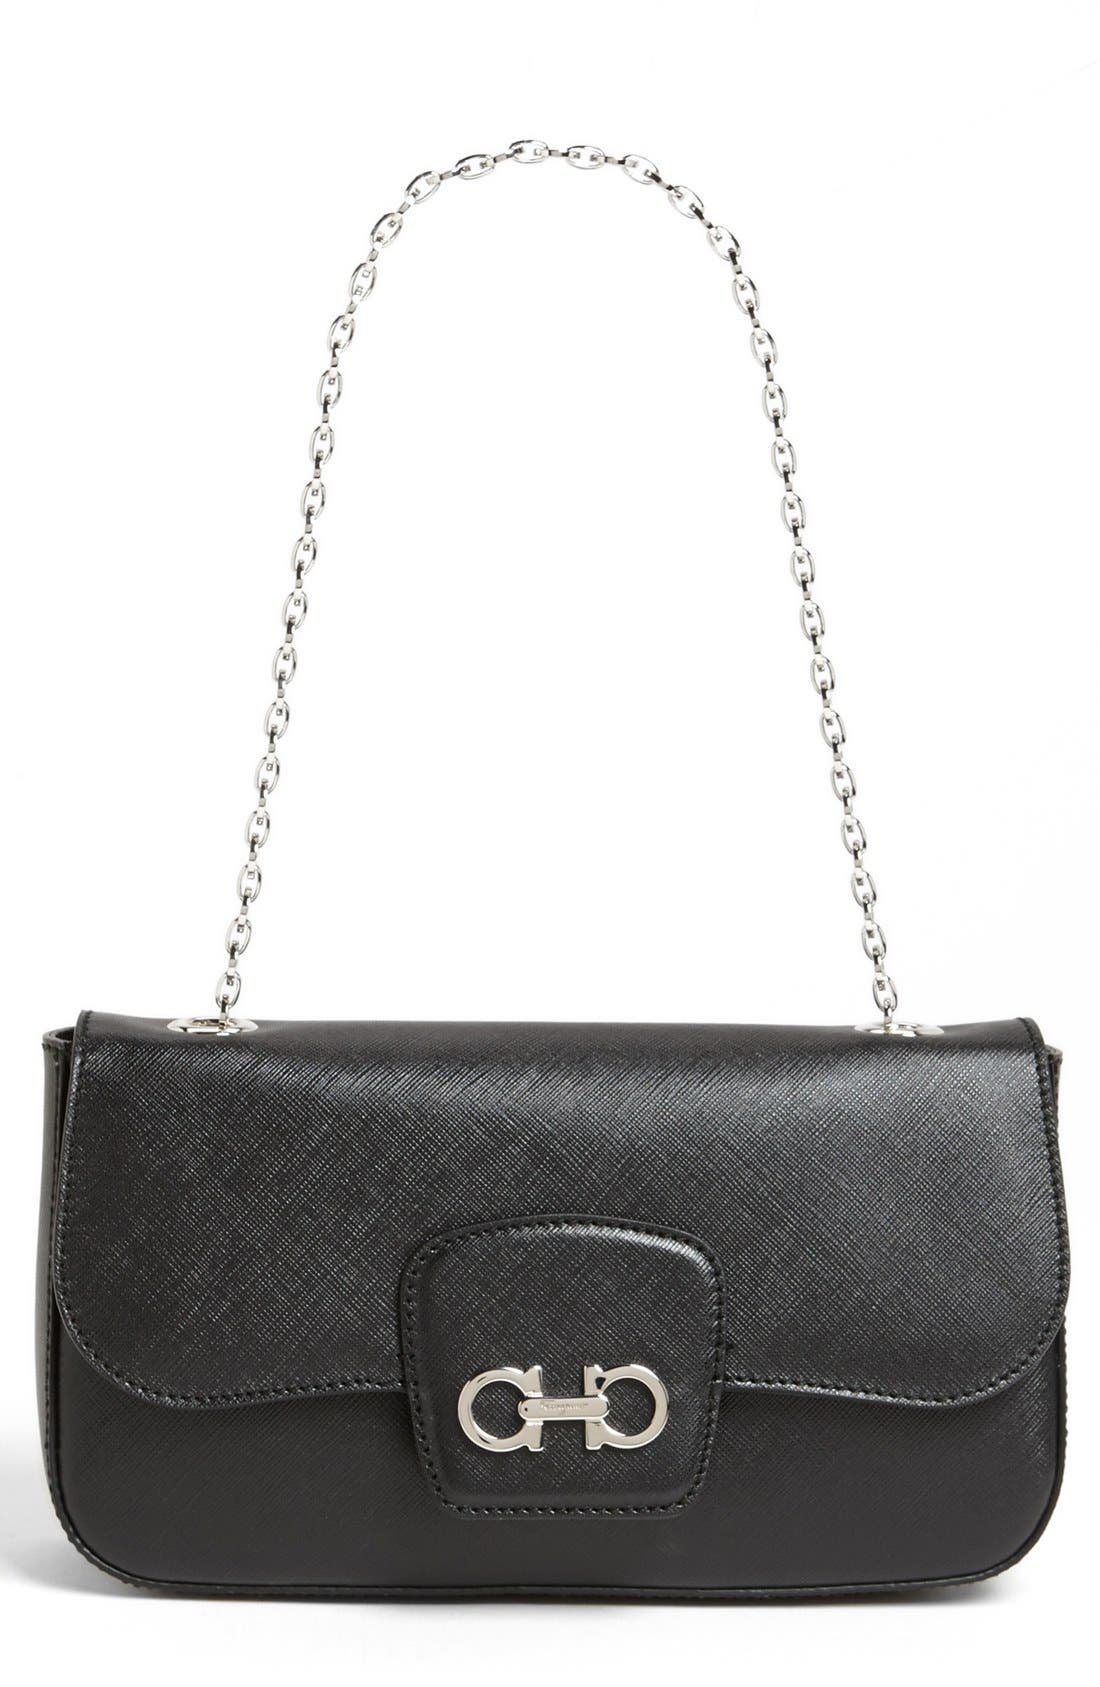 Alternate Image 1 Selected - Salvatore Ferragamo 'Rory' Leather Shoulder Bag